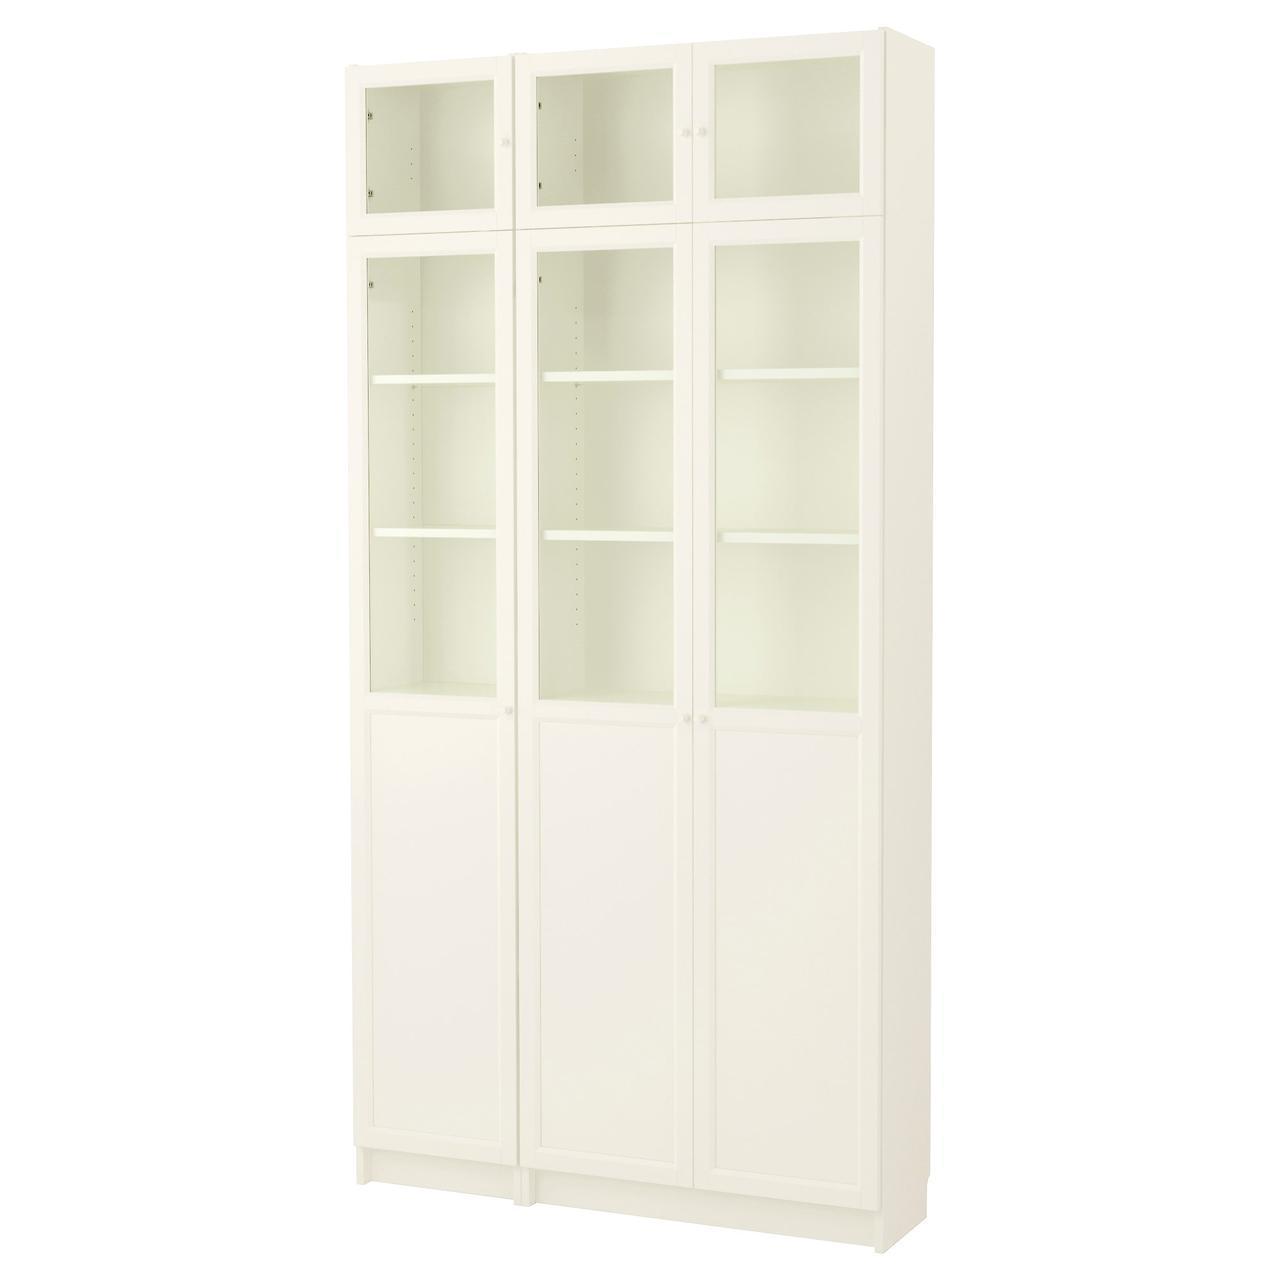 IKEA BILLY / OXBERG (592.177.24) Шкаф/Сервант, черно-белый